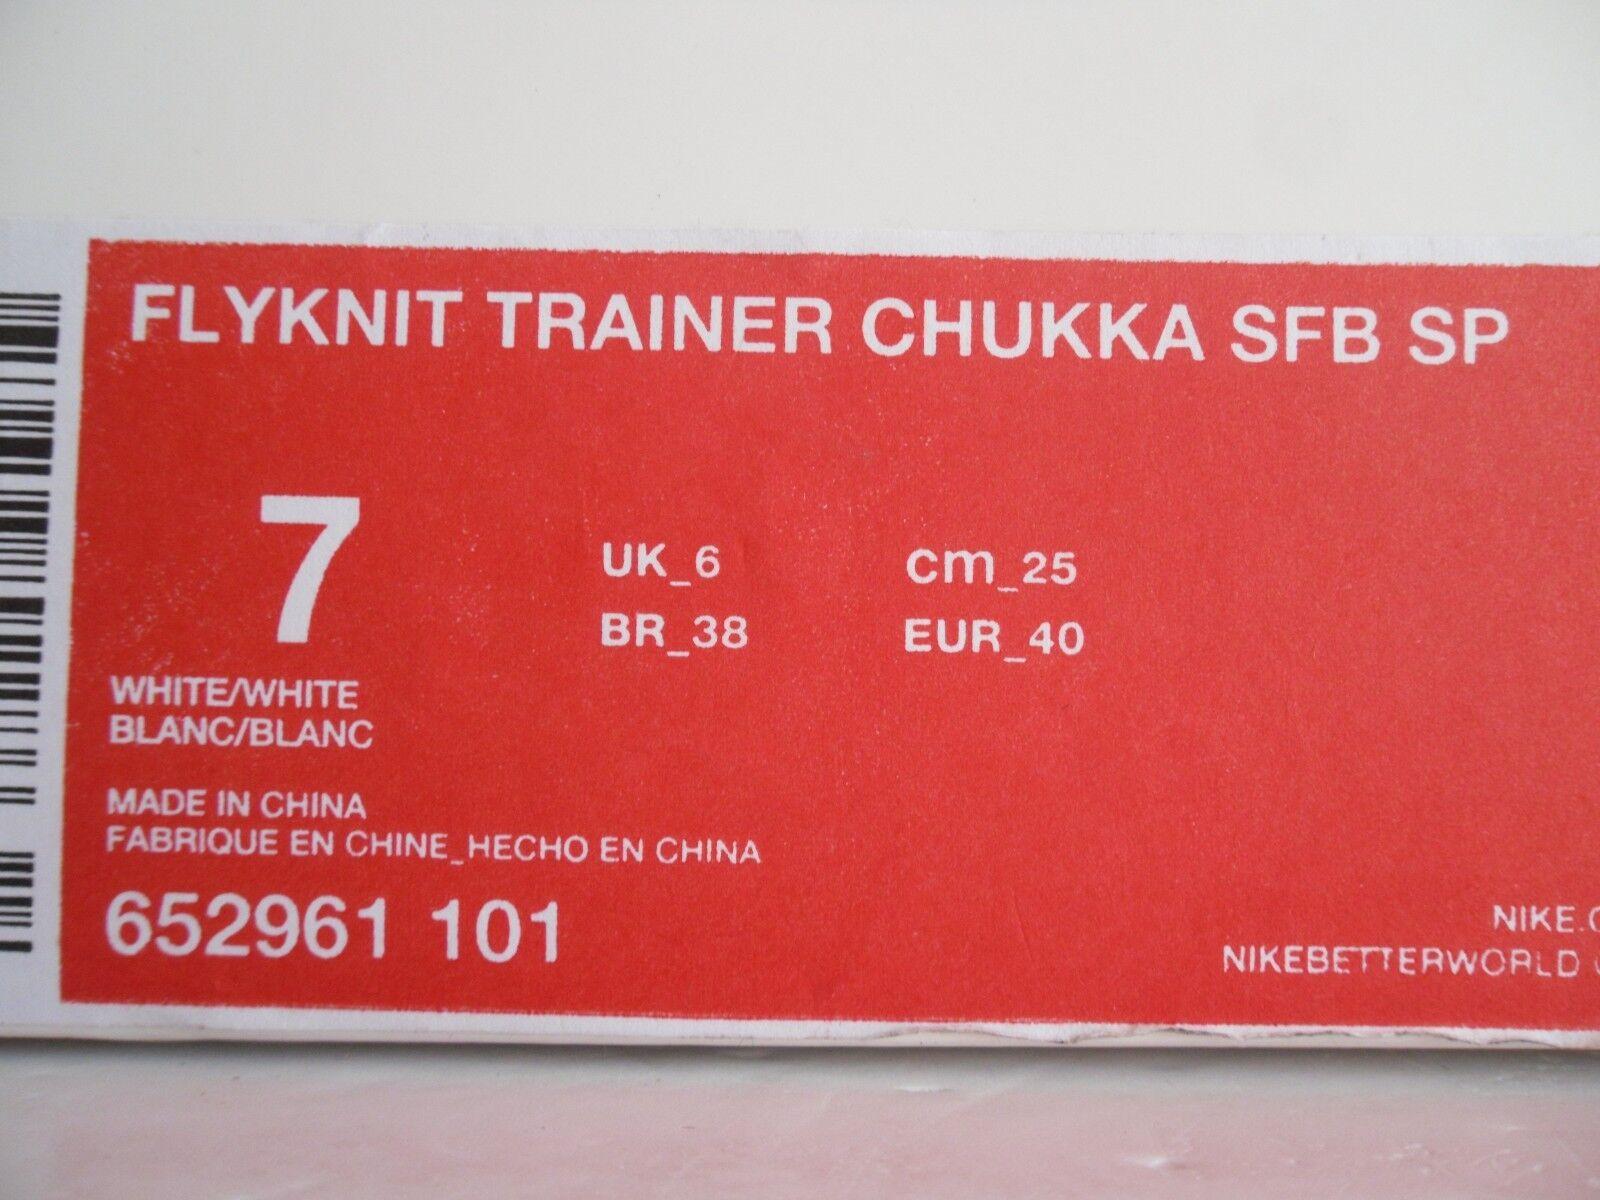 nike flyknit trainer white-white - chukka sfb sp white-white trainer sz 7 0 tier! 90ff9a